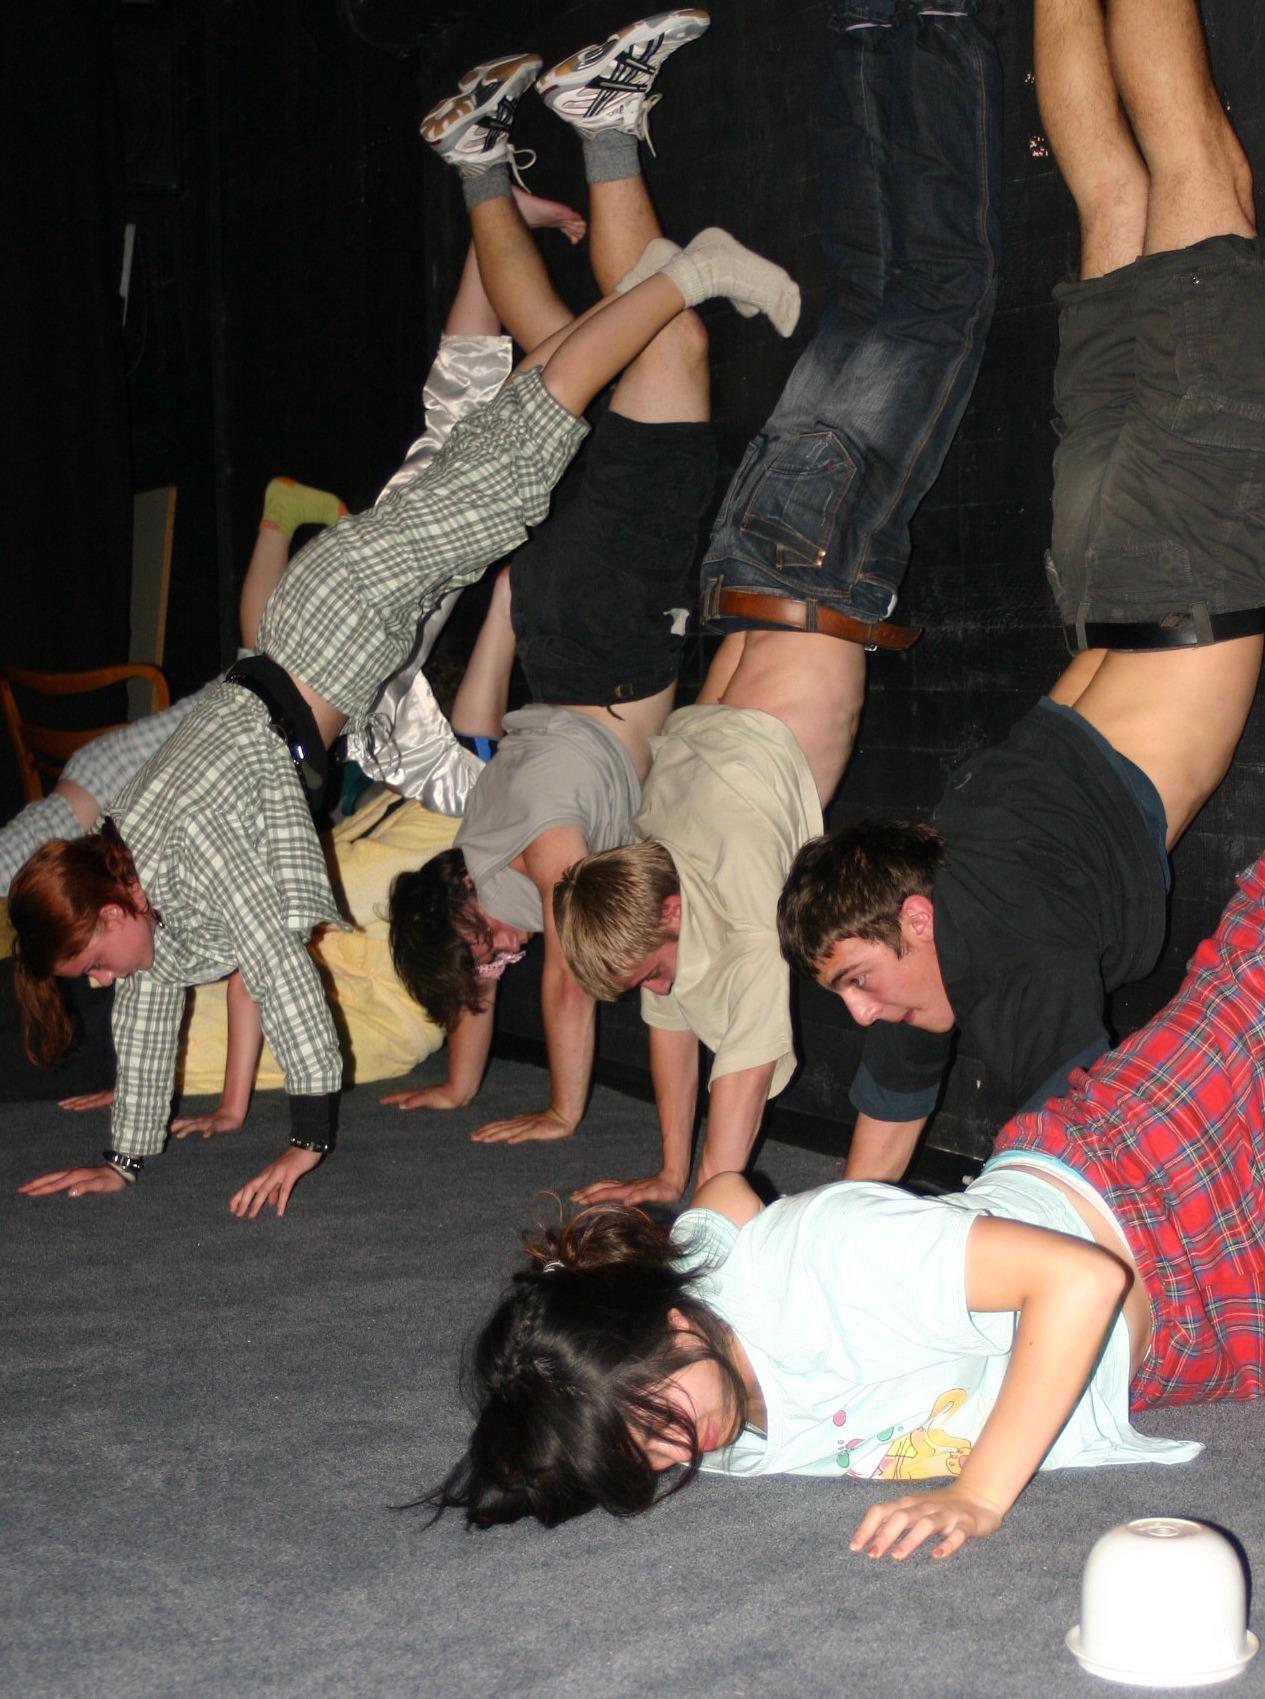 Angewandte Theaterforschung untersucht Performences